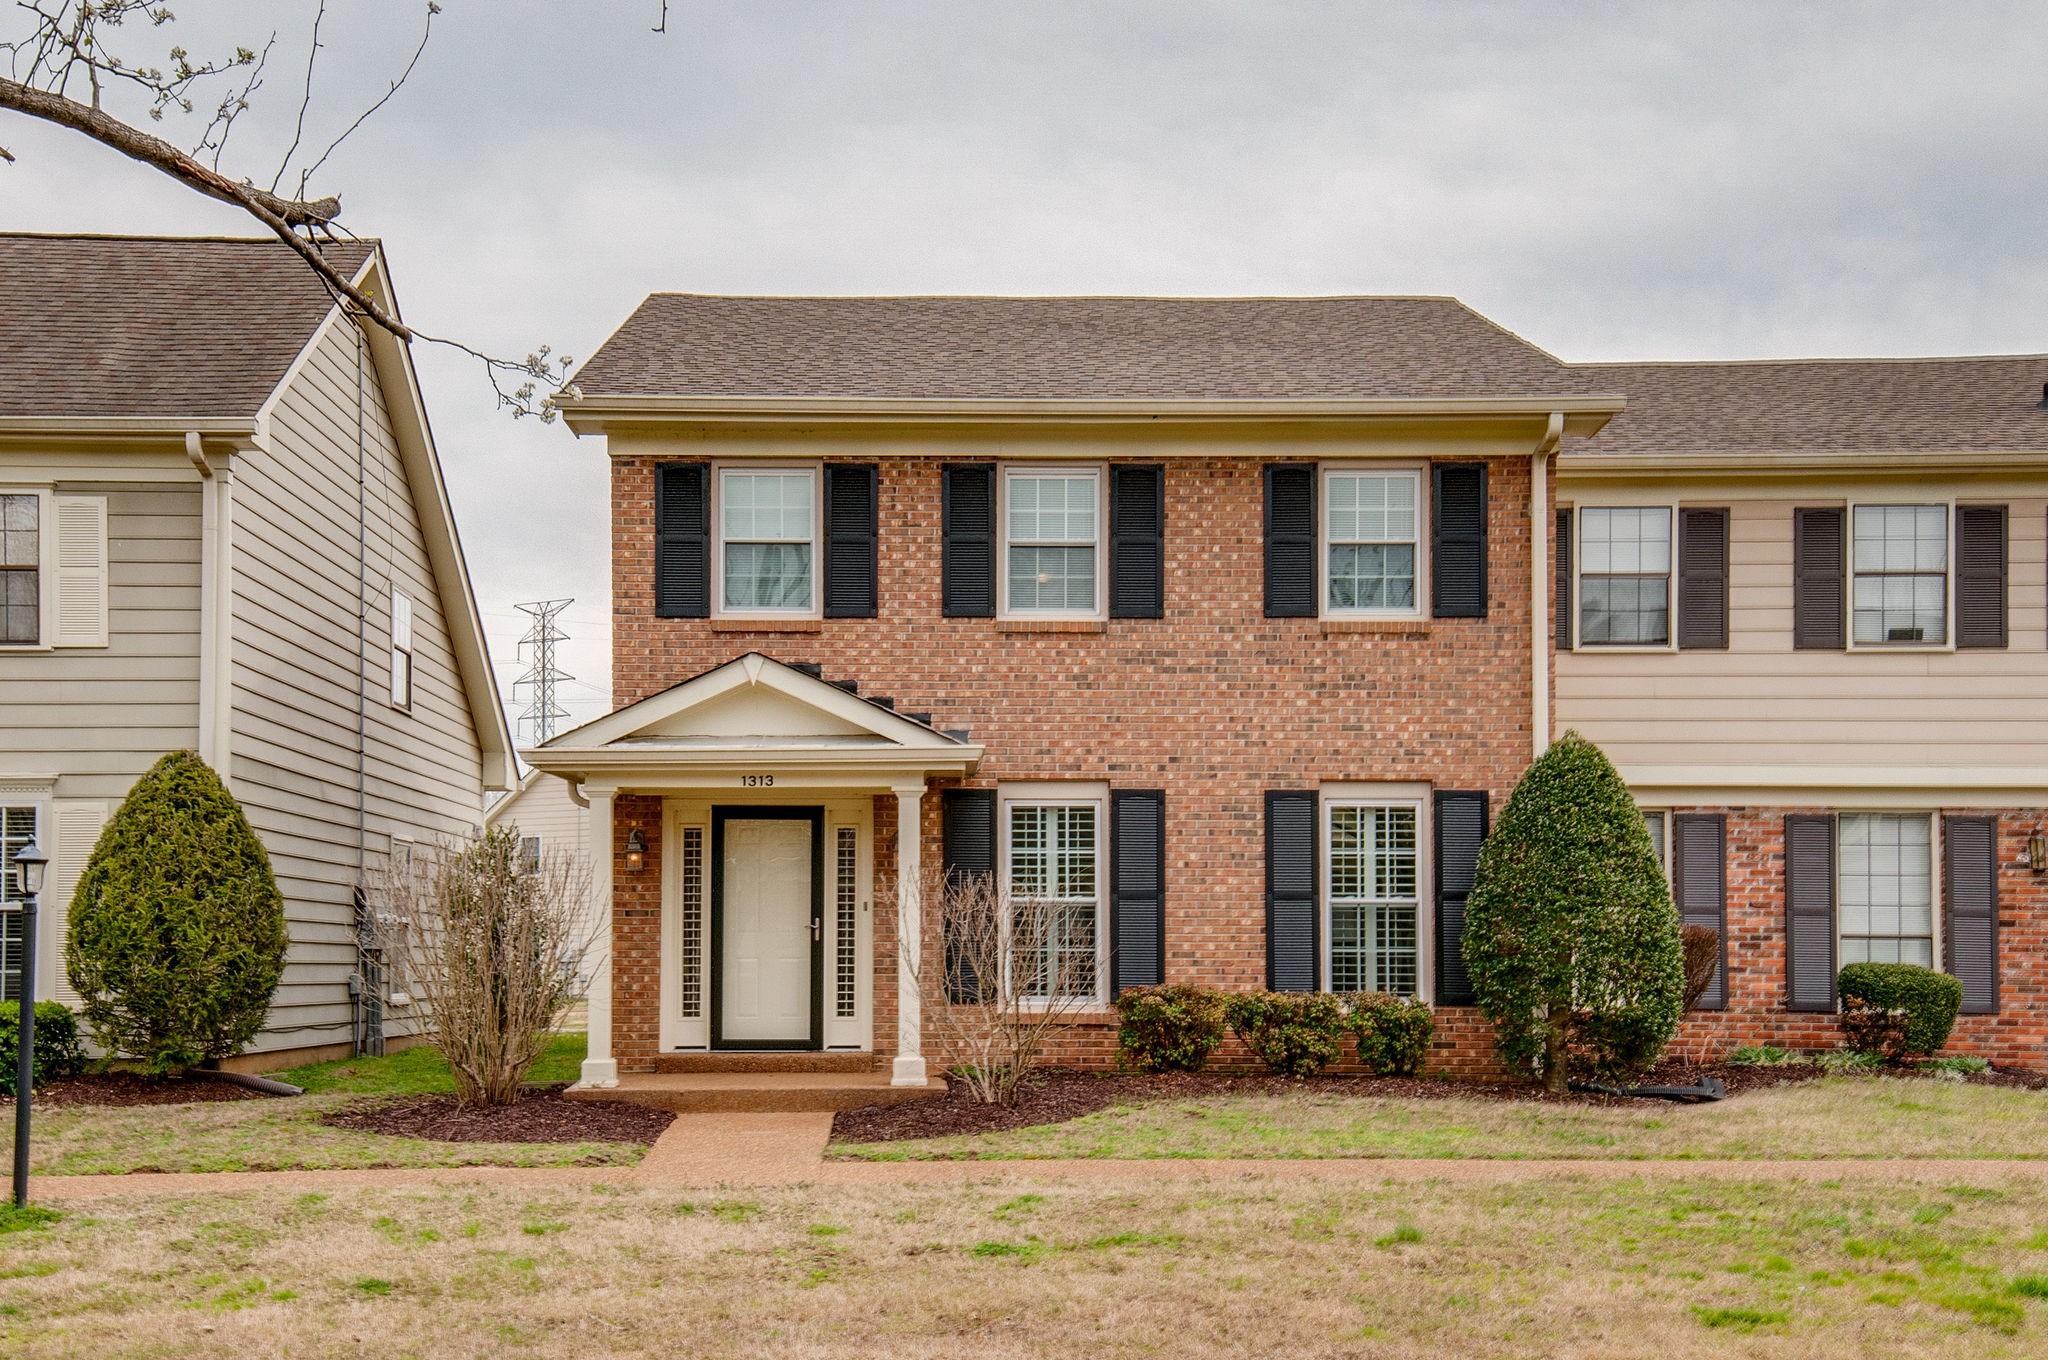 1313 General George Patton Rd, Nashville, TN 37221 - Nashville, TN real estate listing